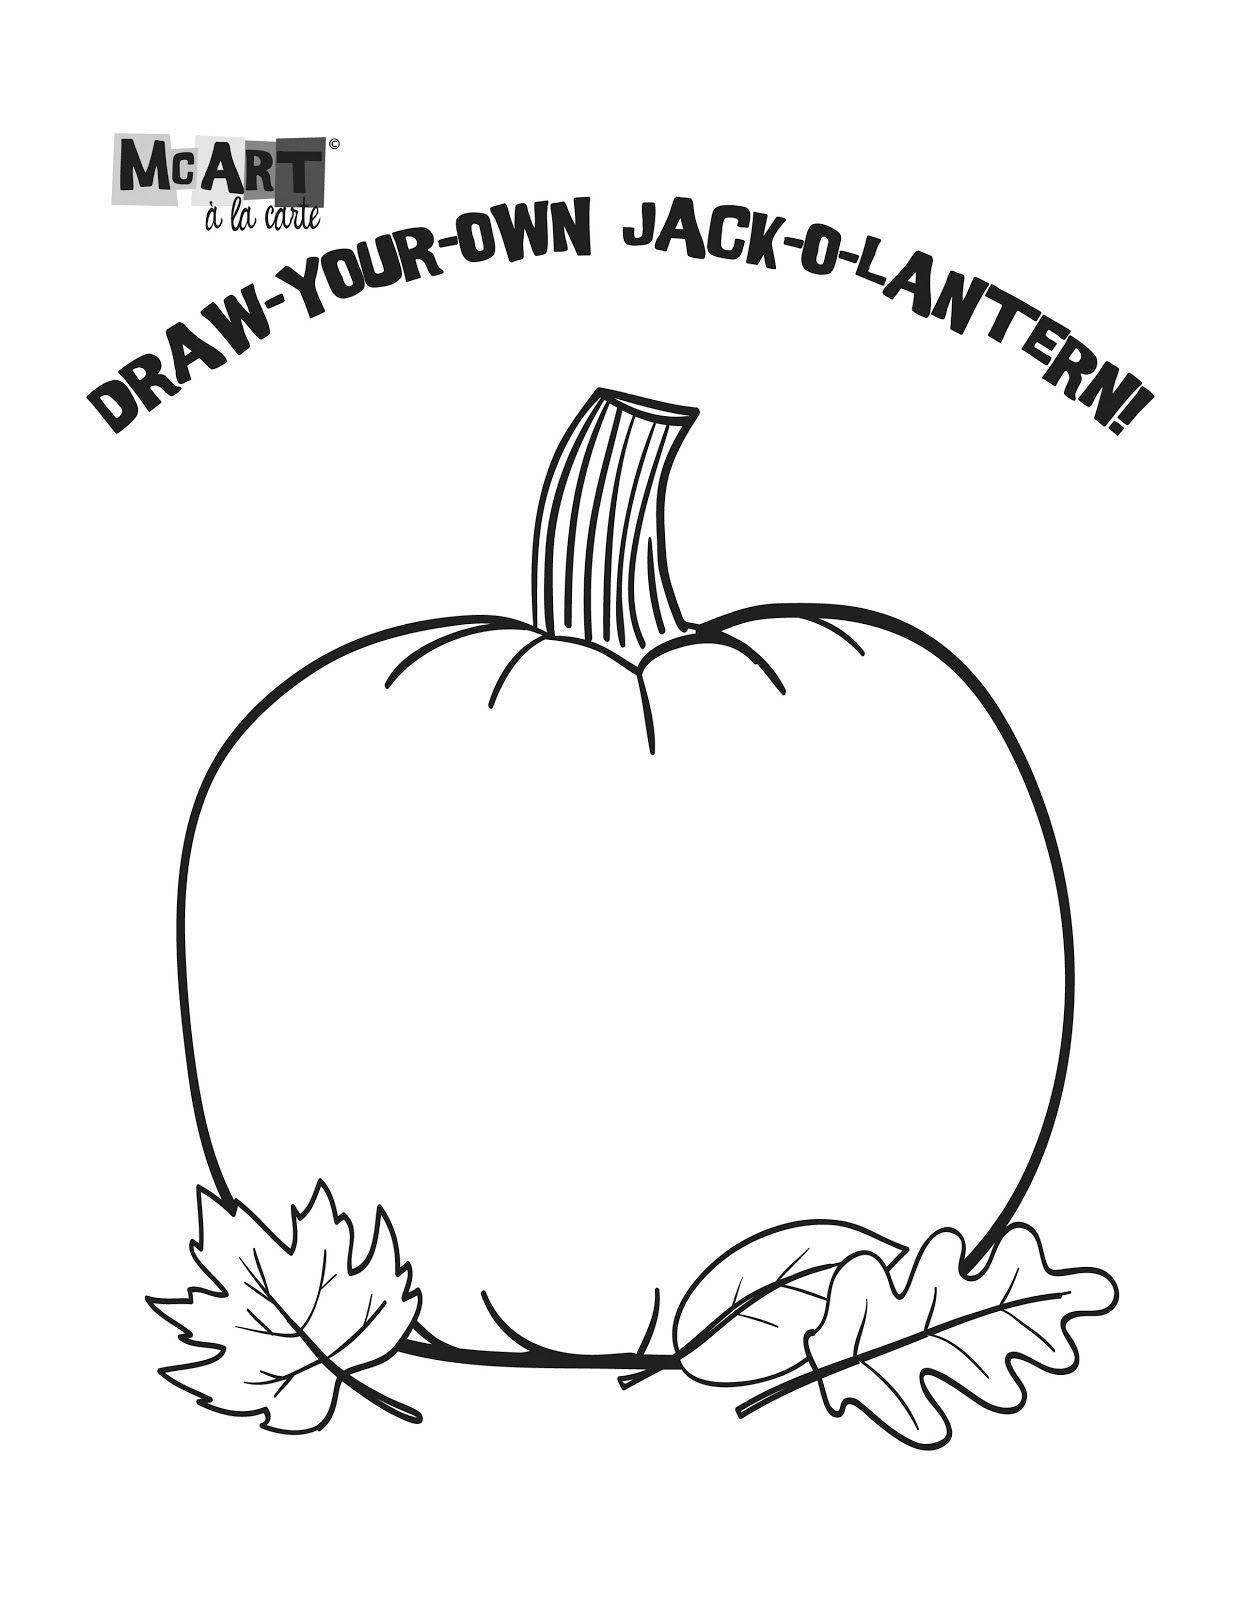 8 Coloring Page Jack O Lantern Jack O Lantern Coloring Pages Shape Coloring Pages